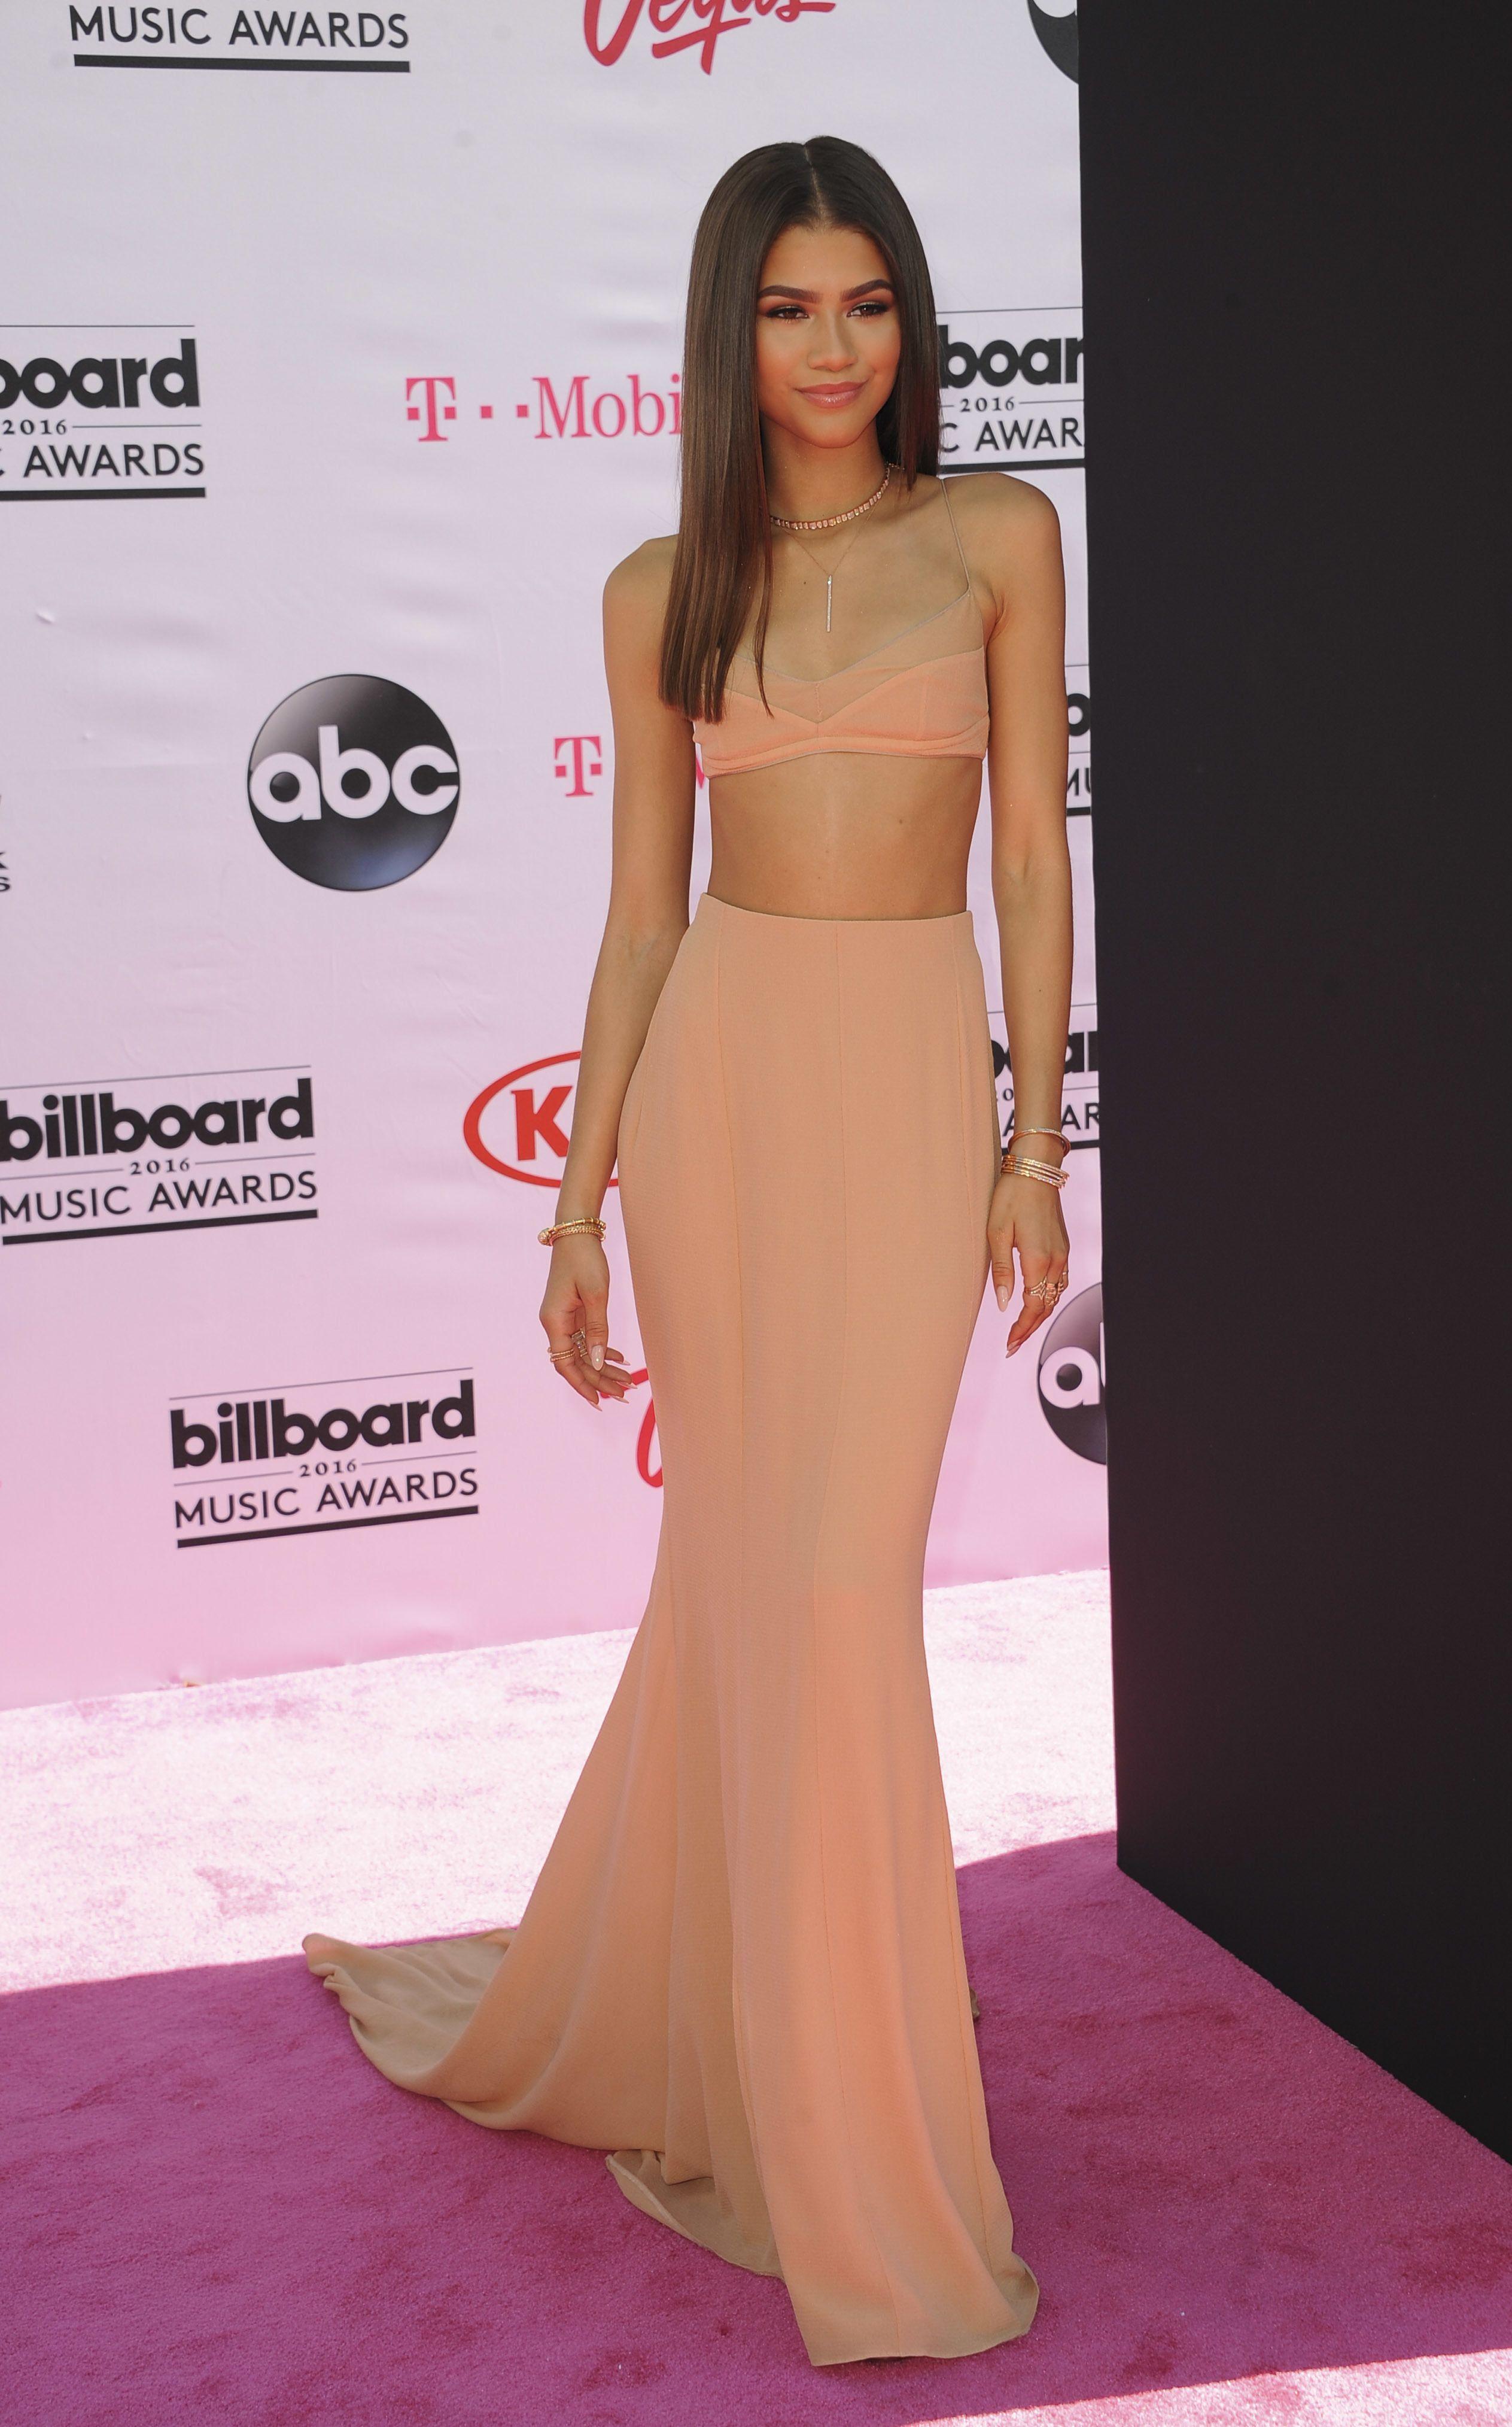 Billboard Music Awards 2016: les looks à ne pas manquer | Redecilla